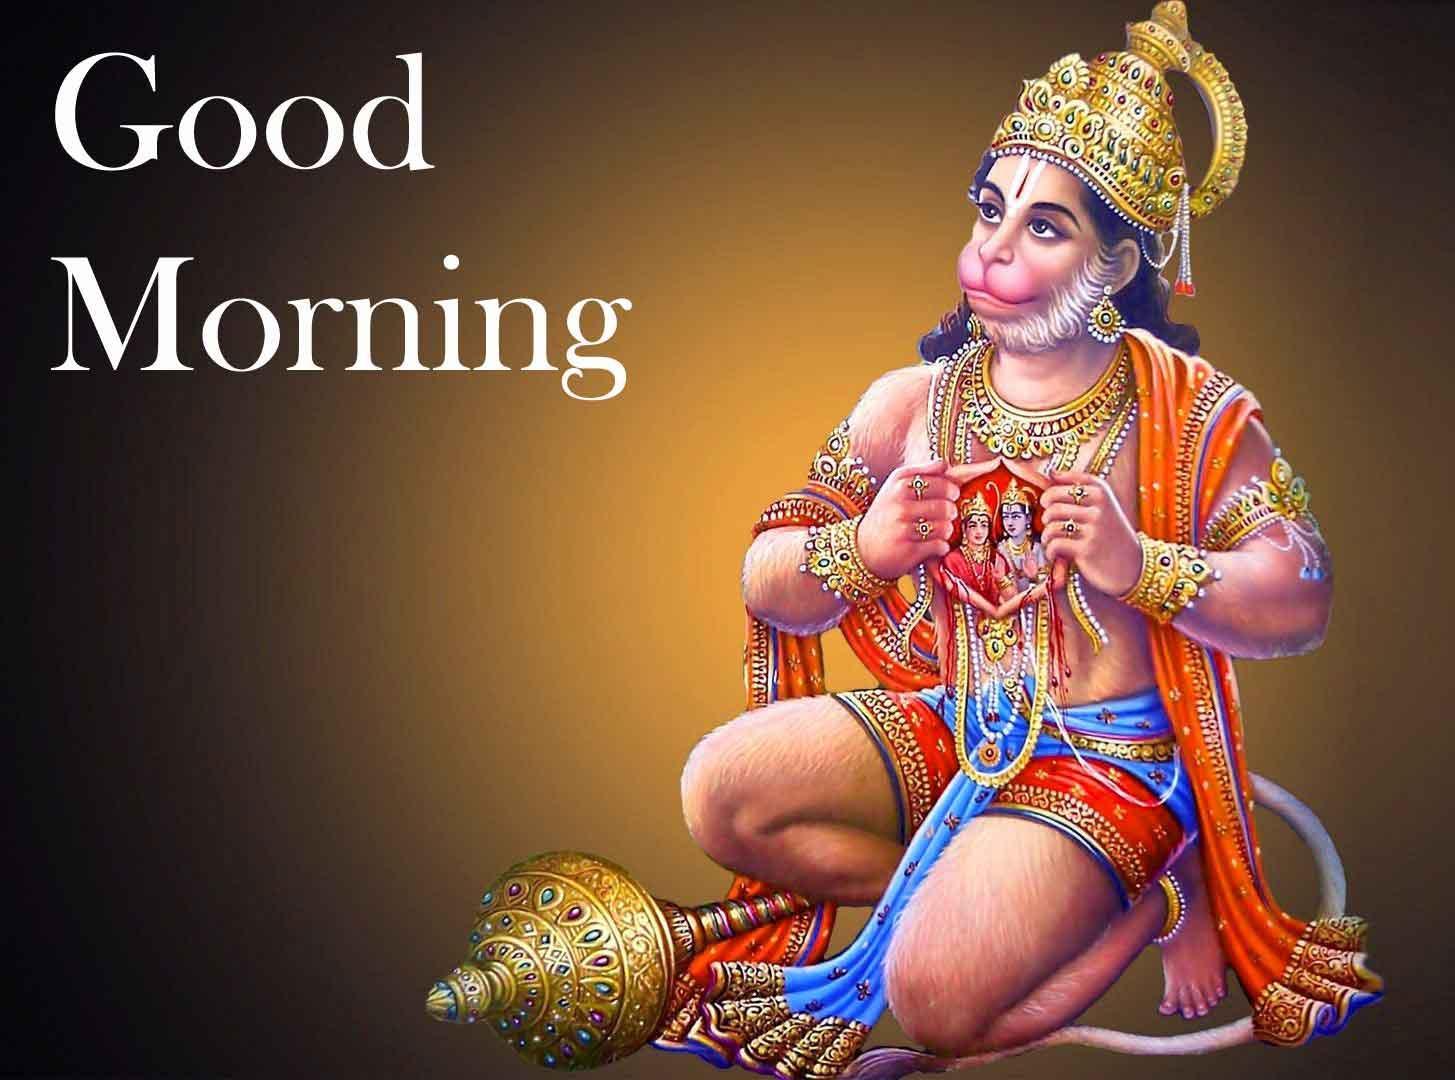 Good Morning Pictures With Hanuman Ji